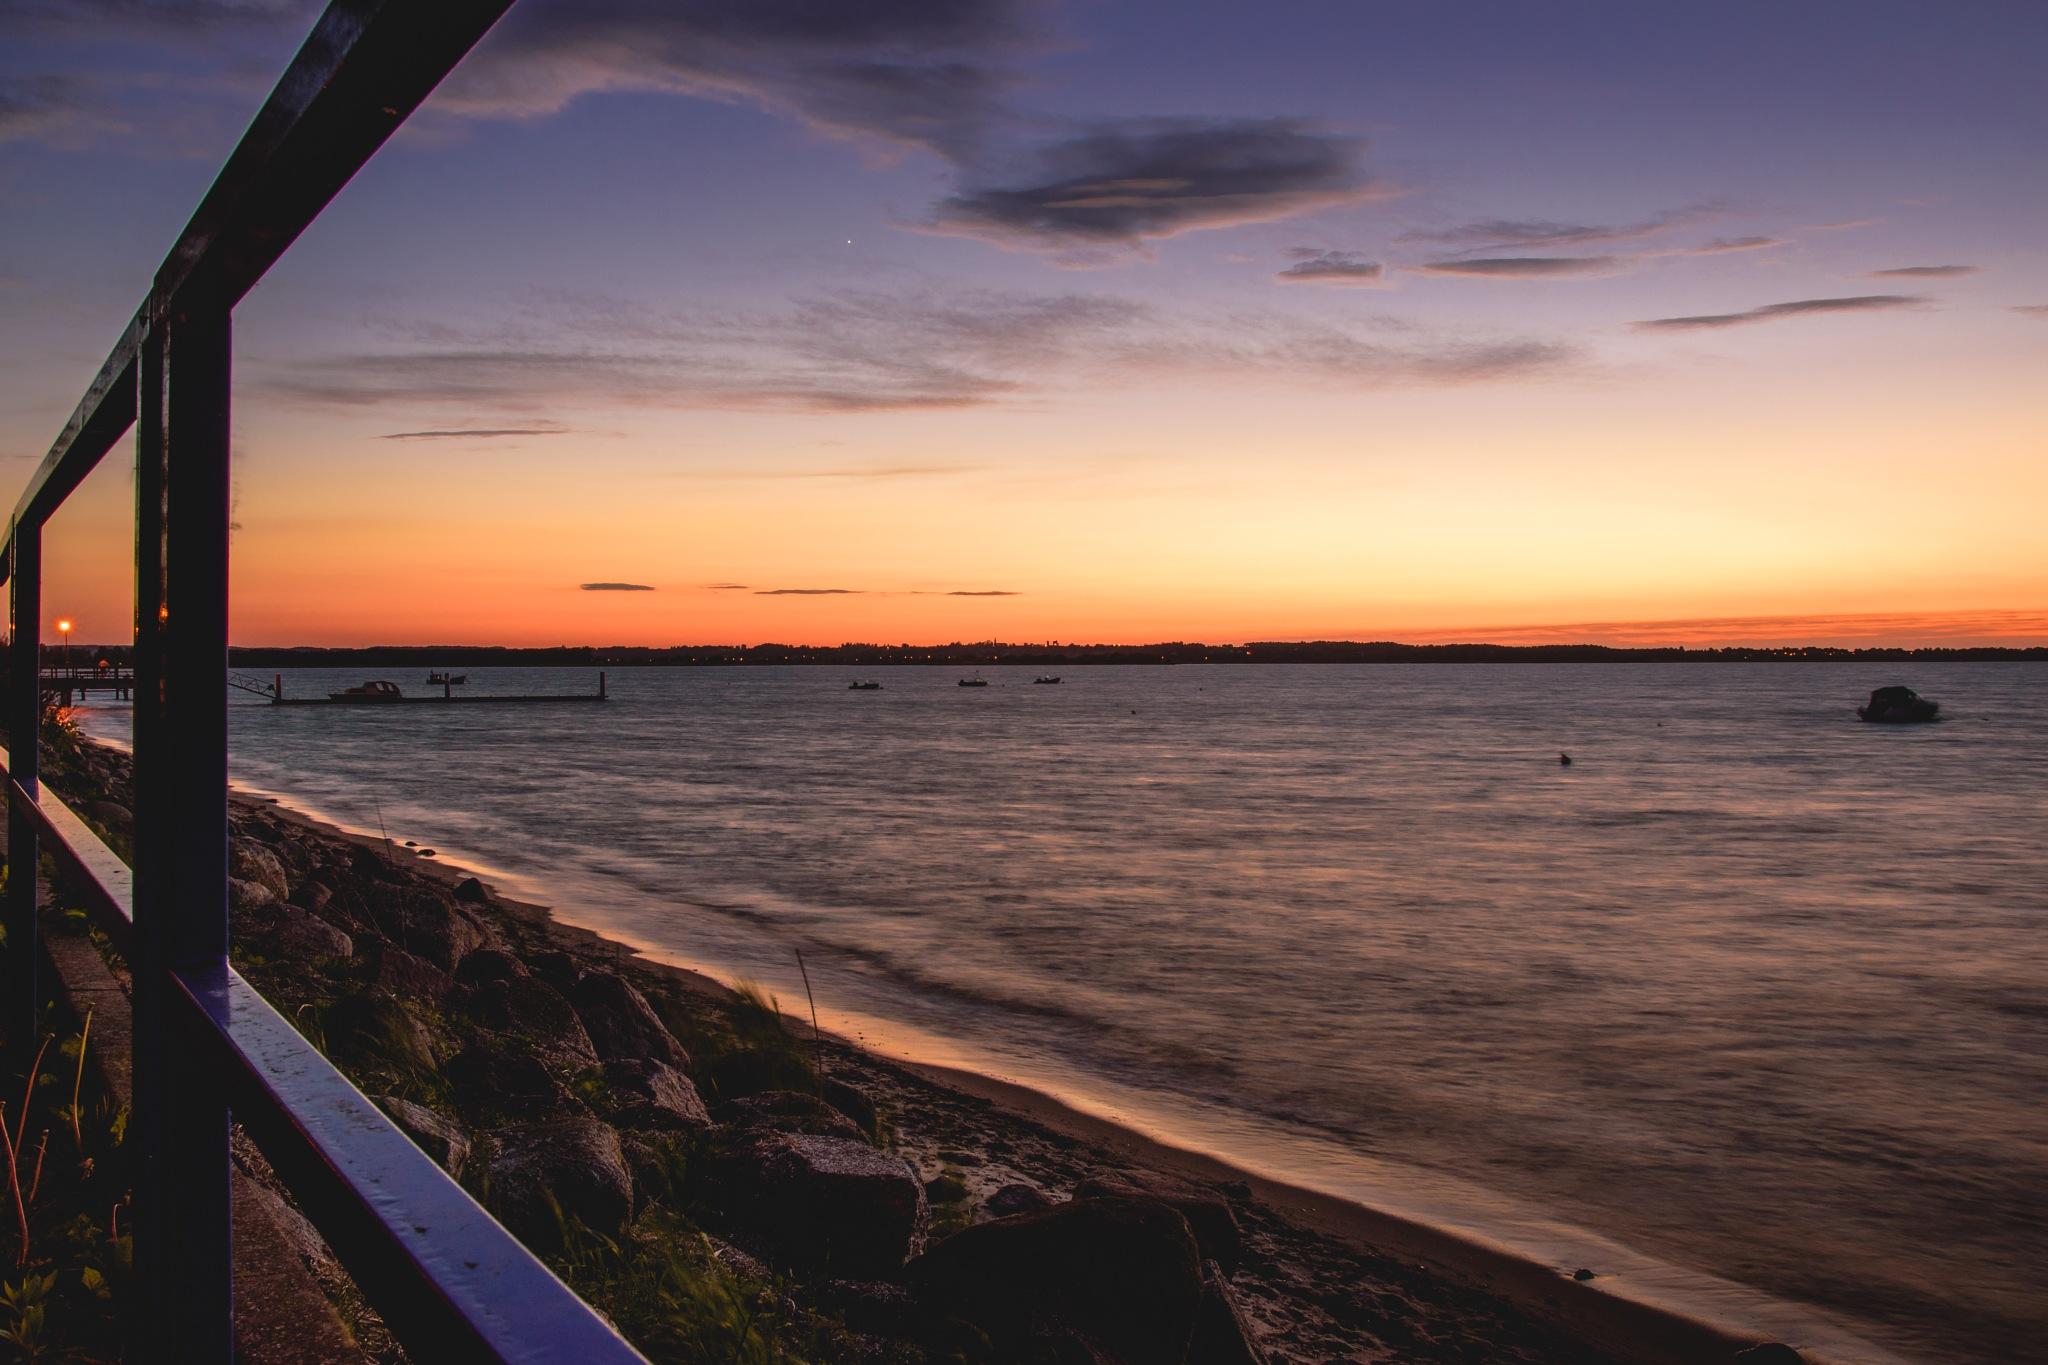 Sunset by Karol Kozak